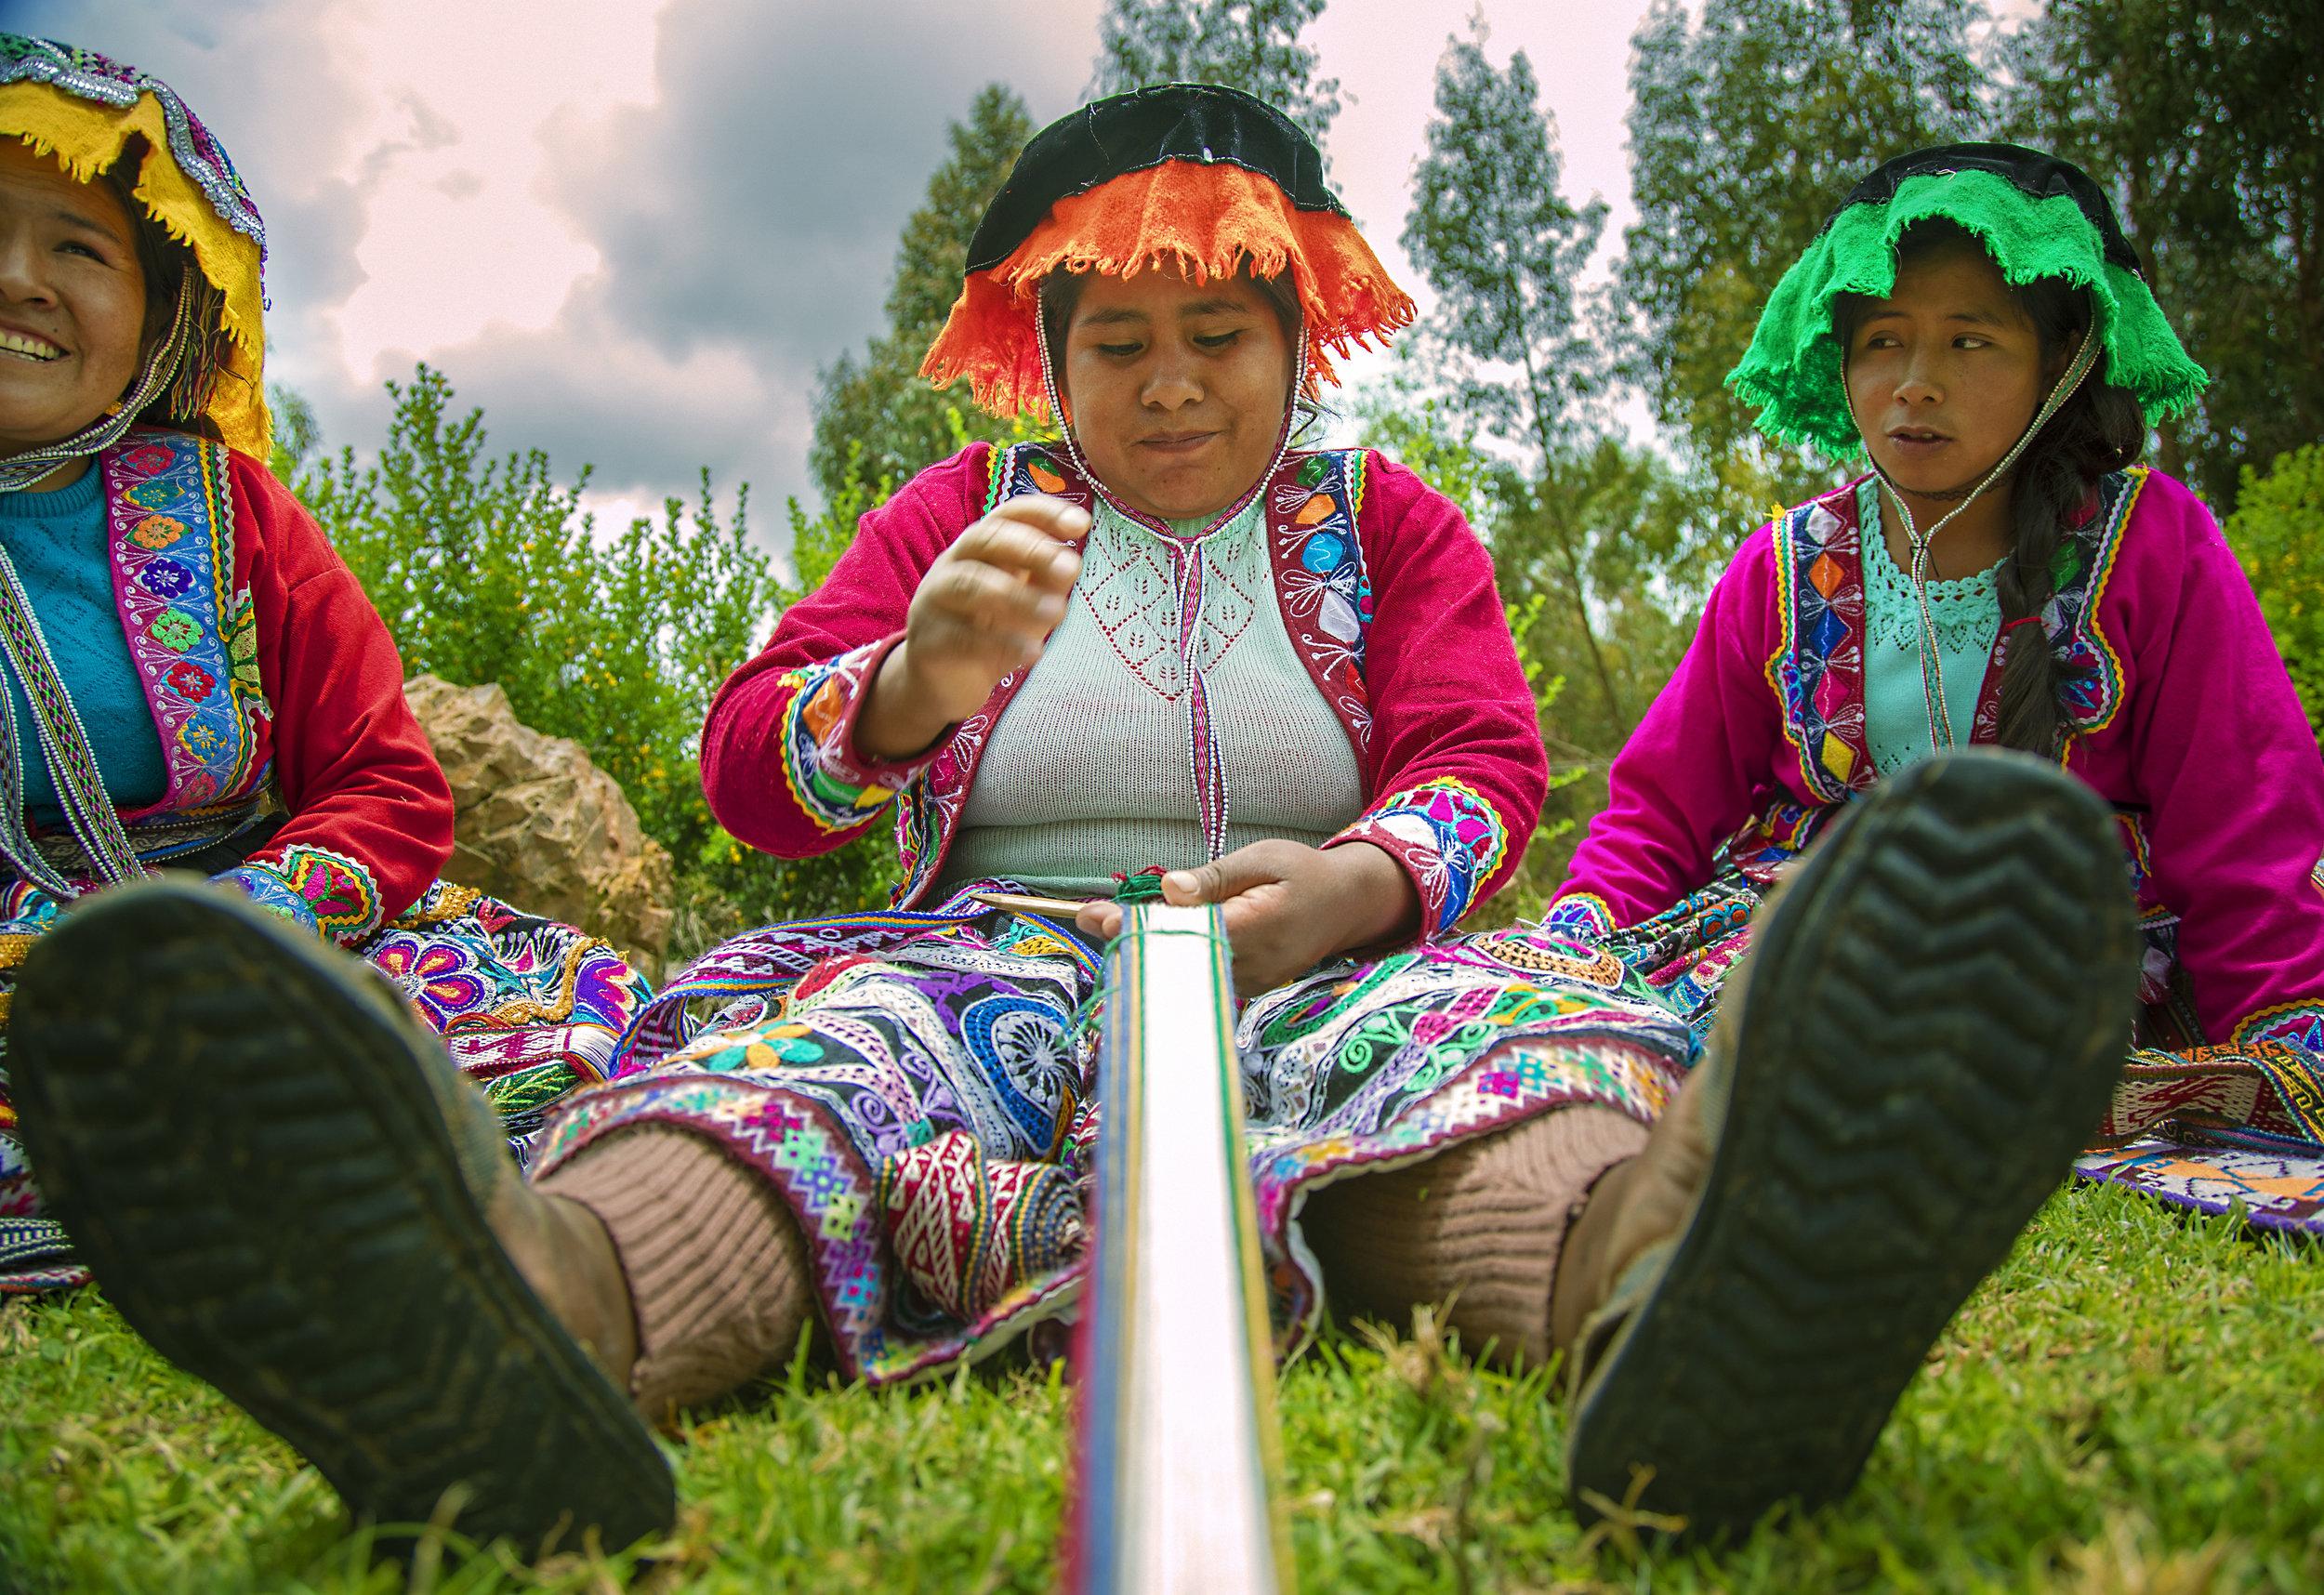 Simon+Needham+Humanitarian+Photography+Peru+18.jpg